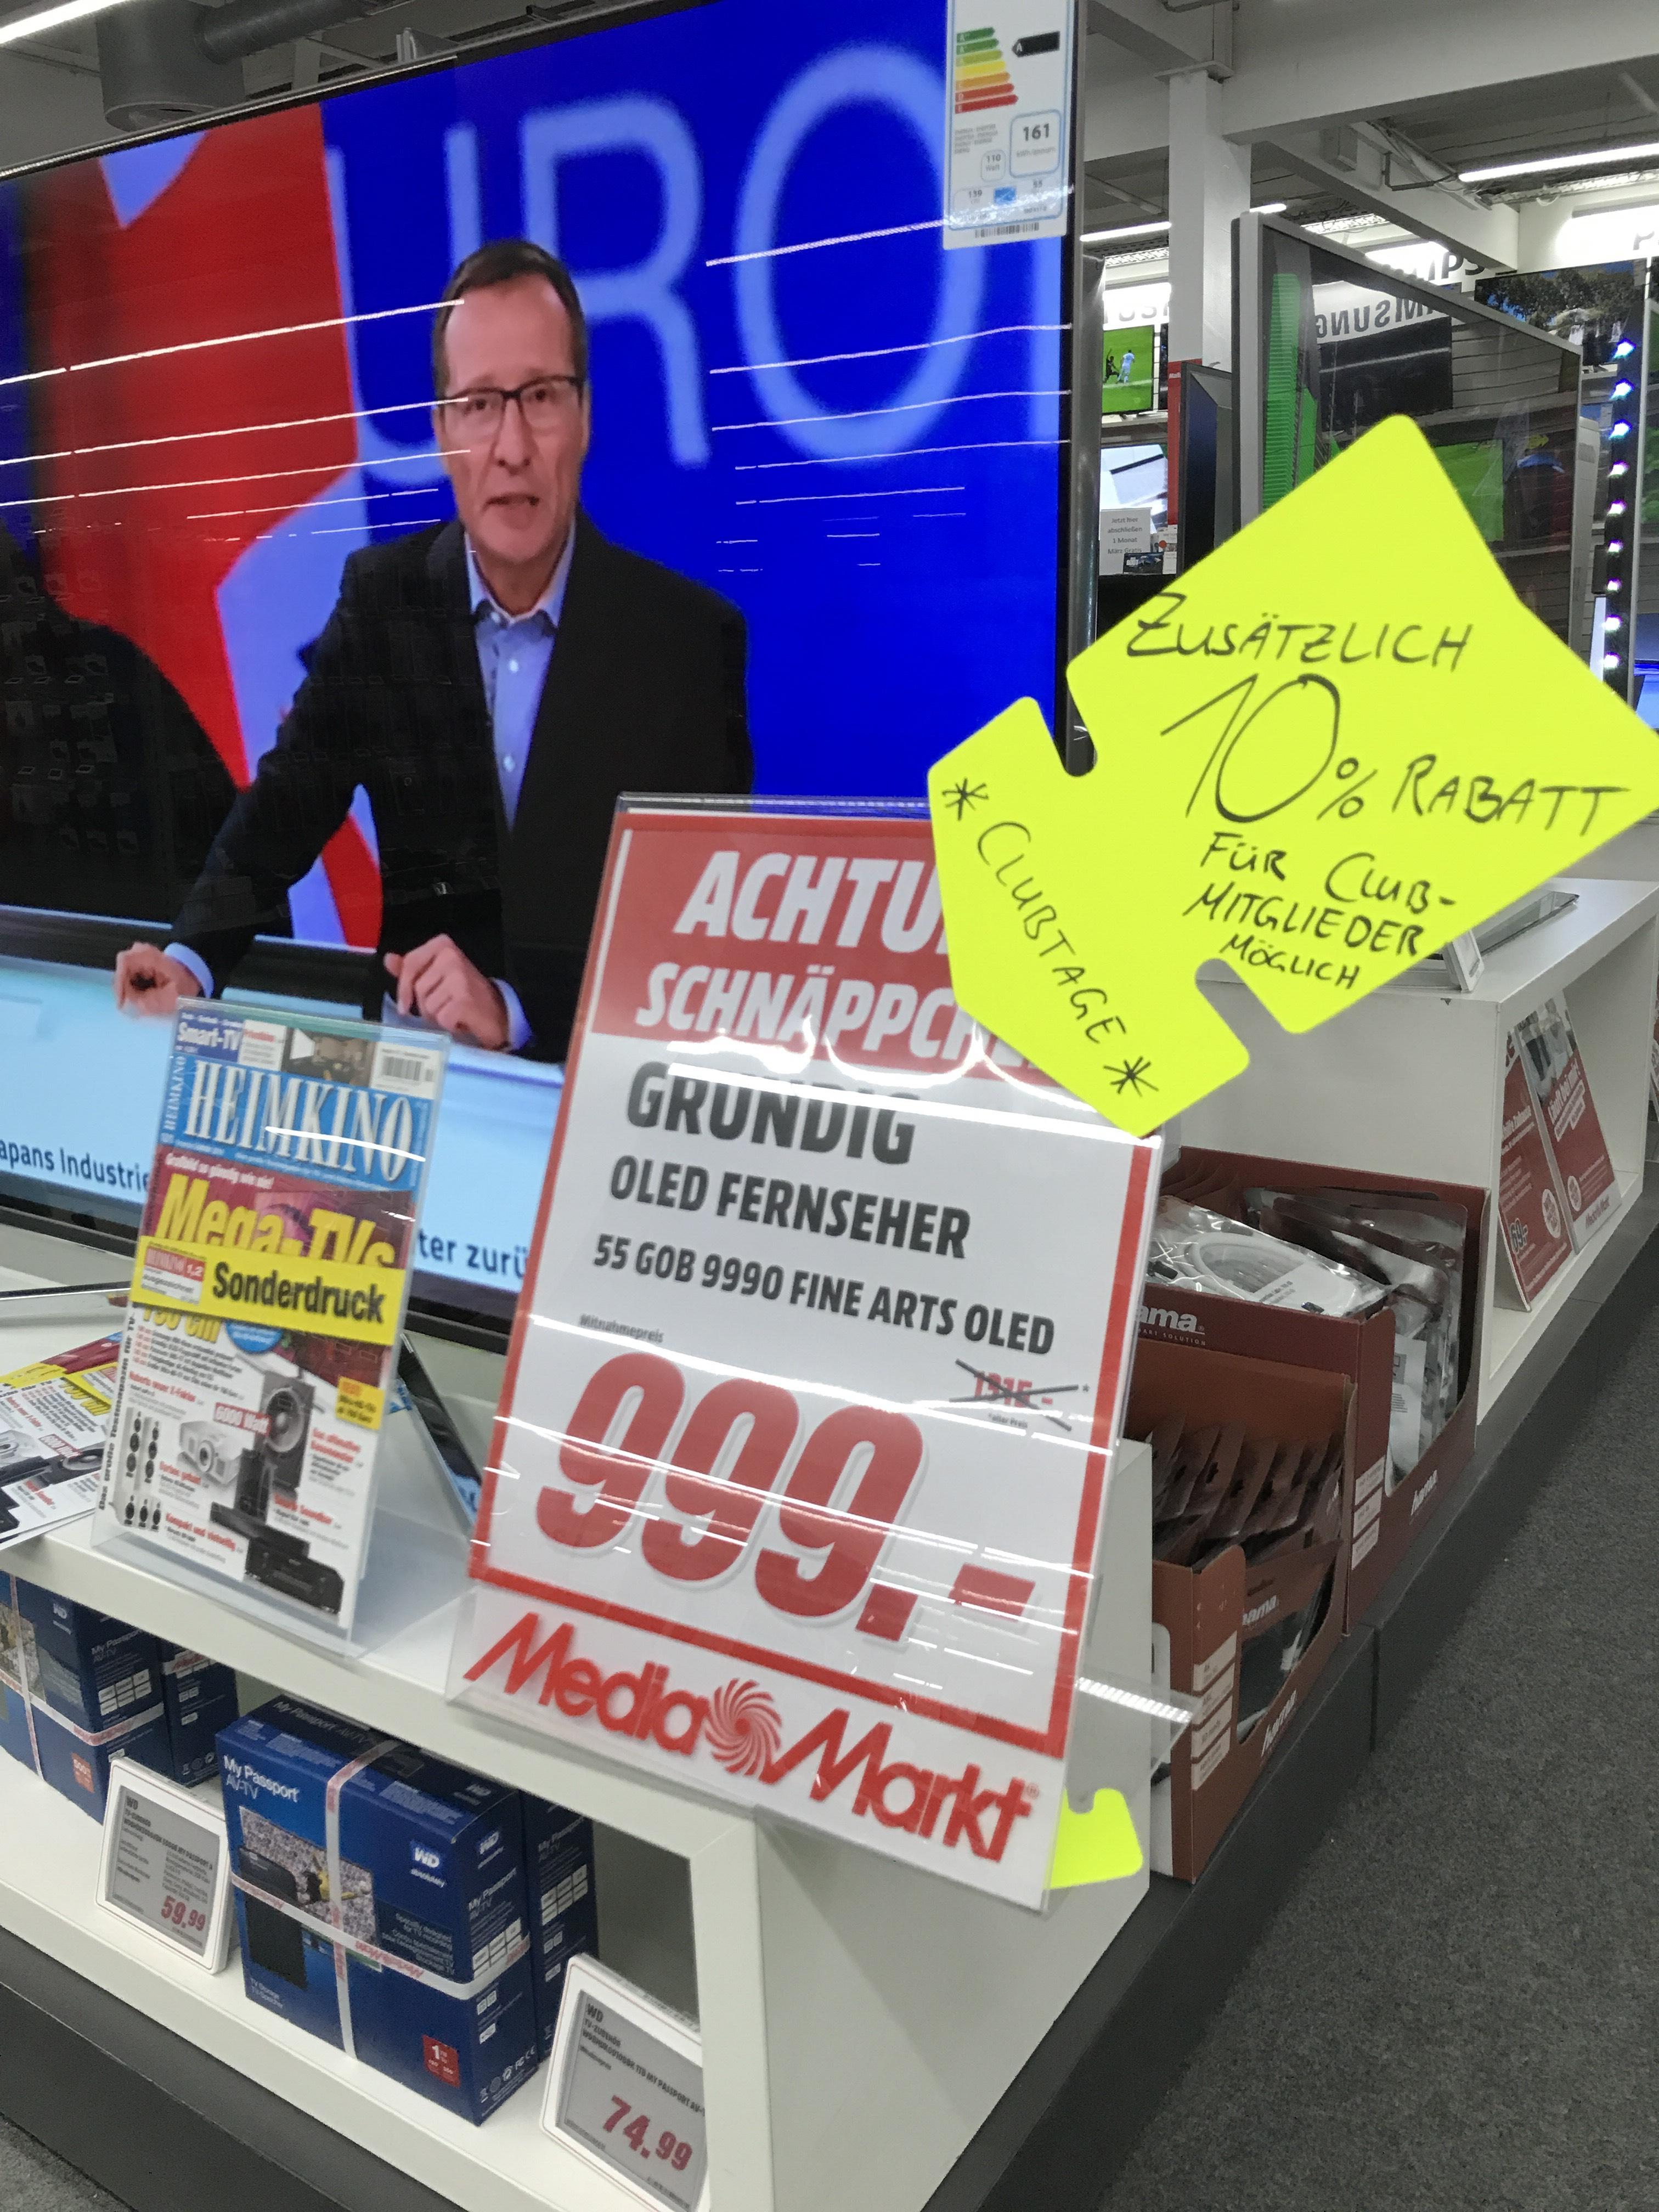 Lokal grundig 55 zoll oled 55 gob 9990 im media markt for Media markt koln marsdorf